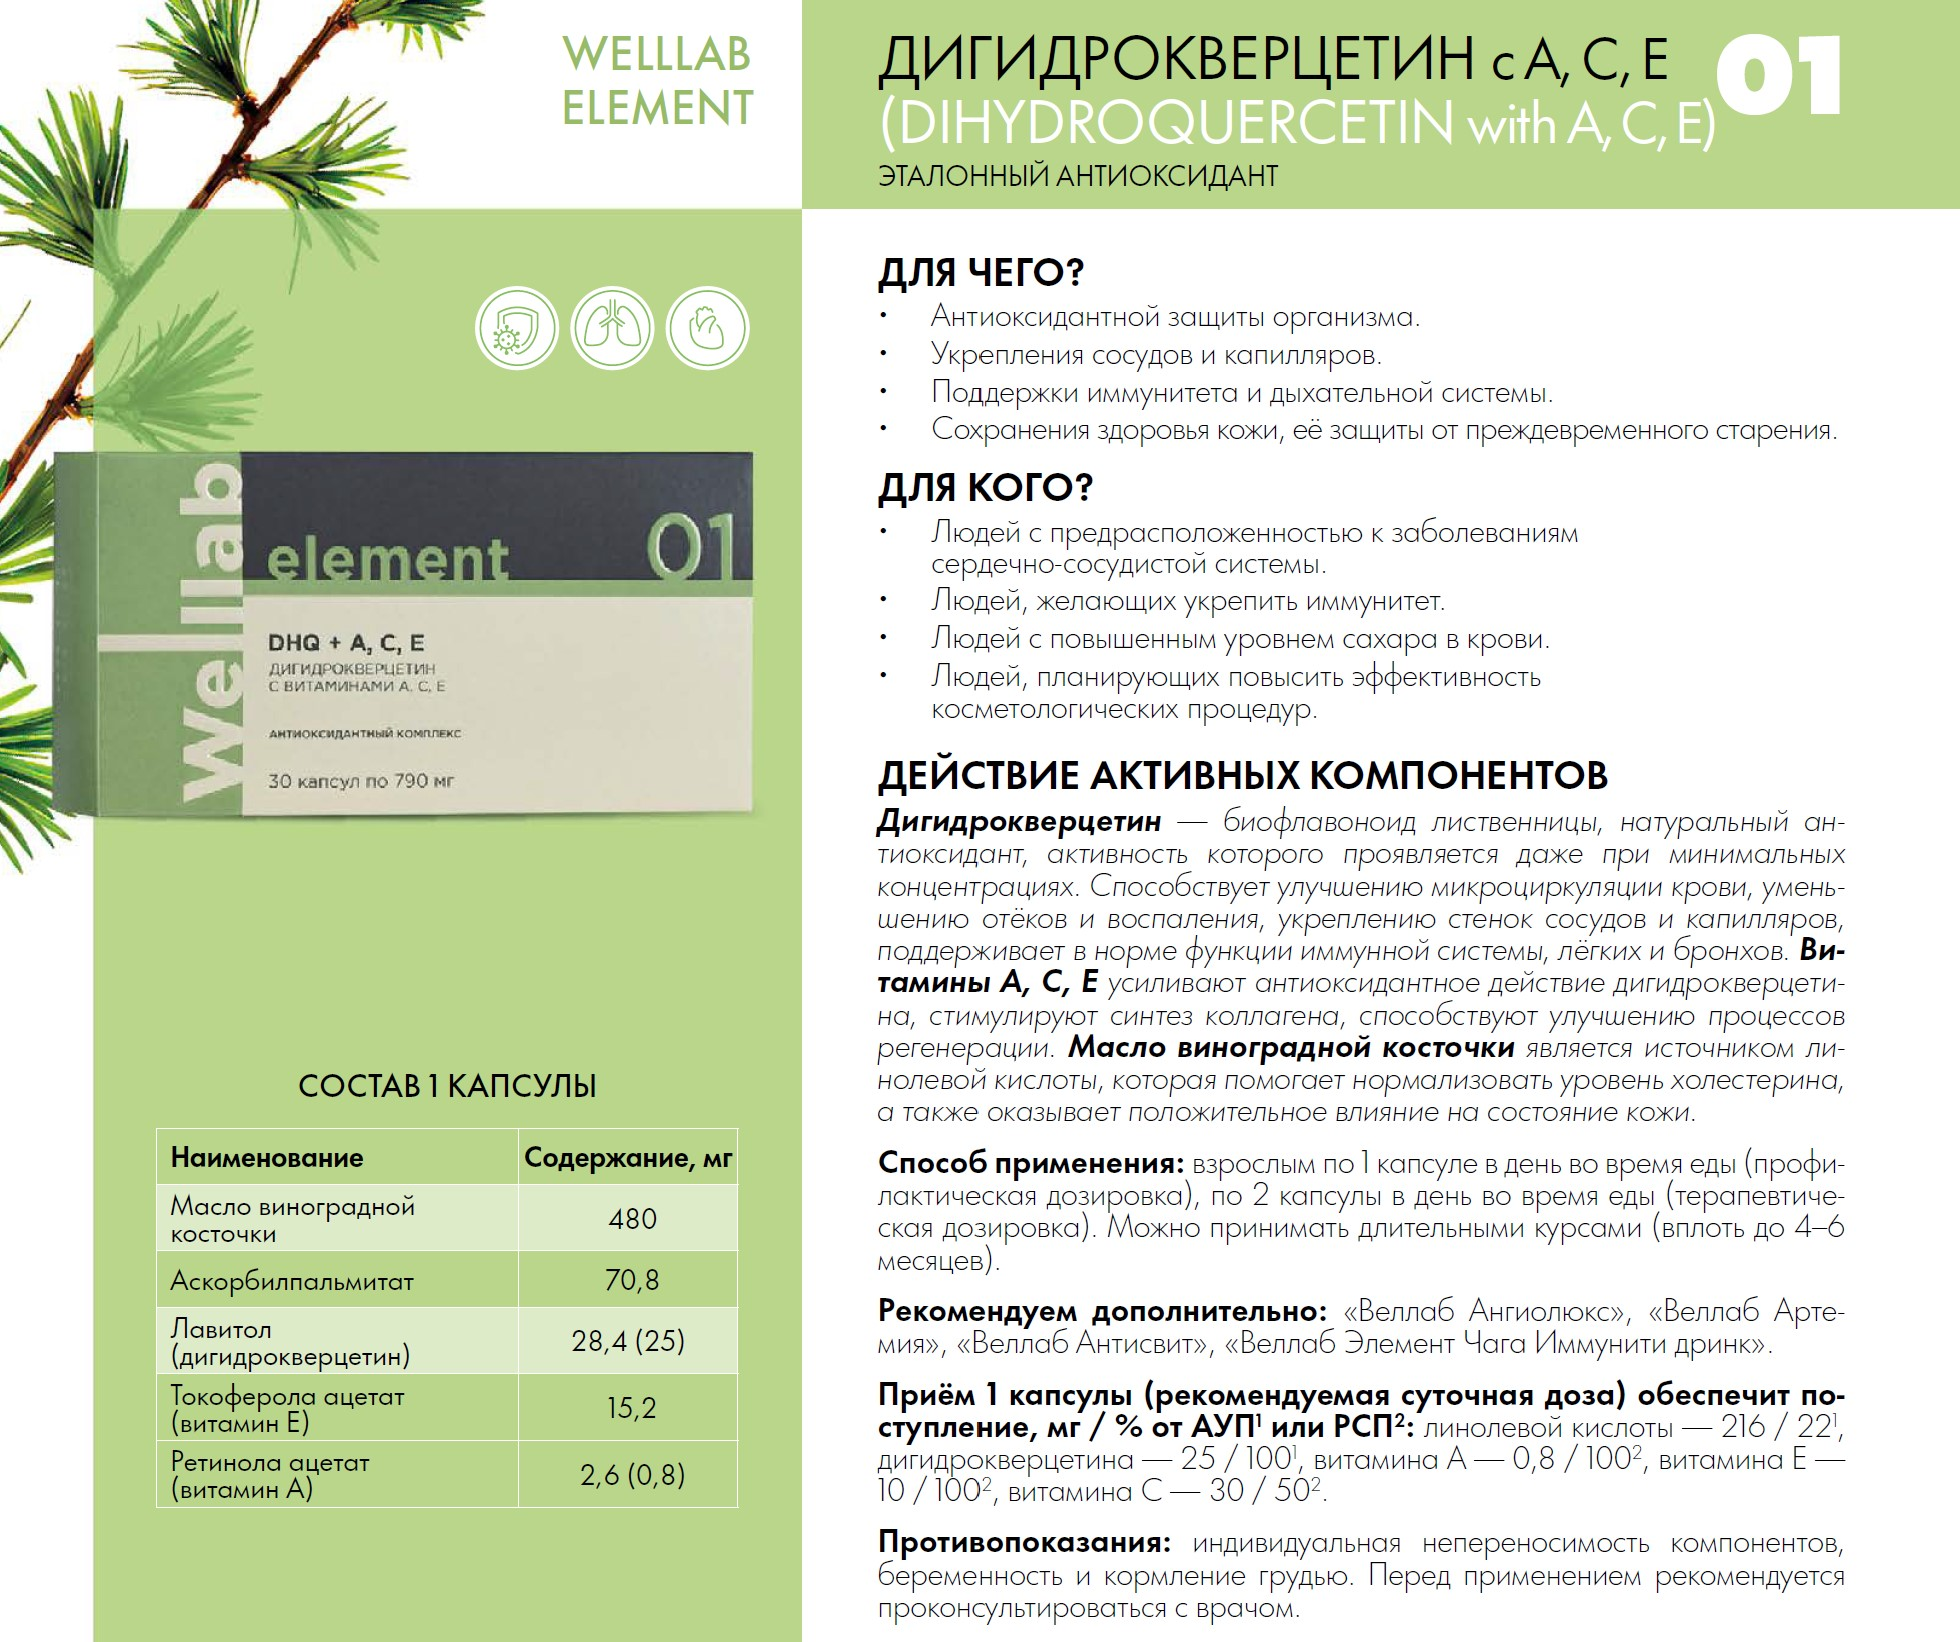 Welllab Element Dihydroquercetin